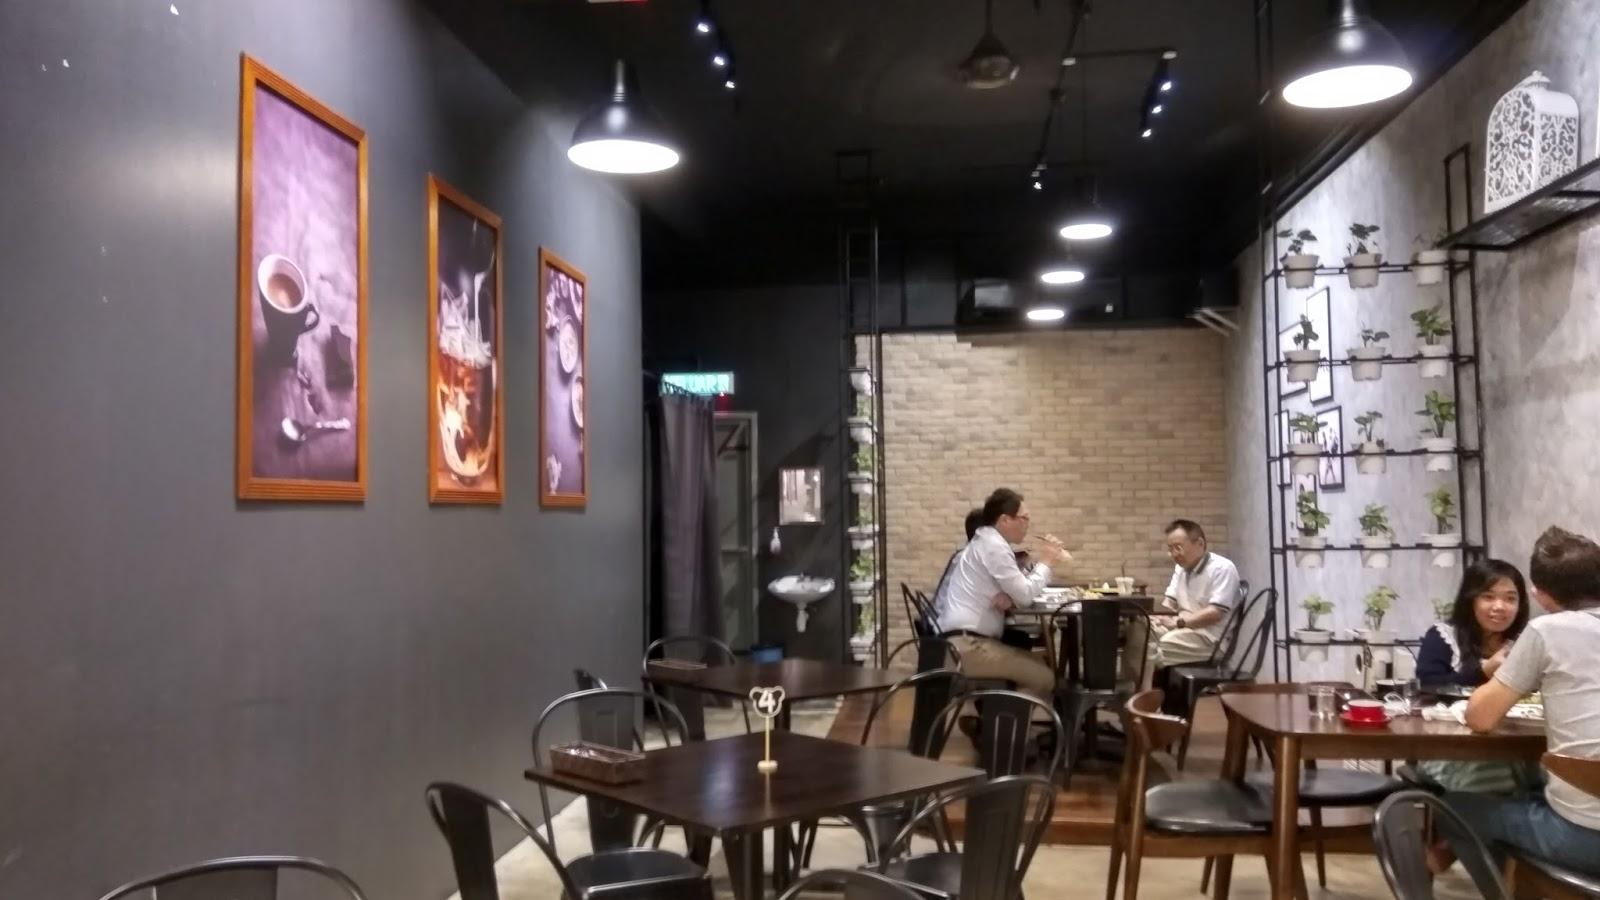 Here\u0027s the location. & It\u0027s About Food!!: Black Door Coffee \u0026 Tea @ Arena Curve